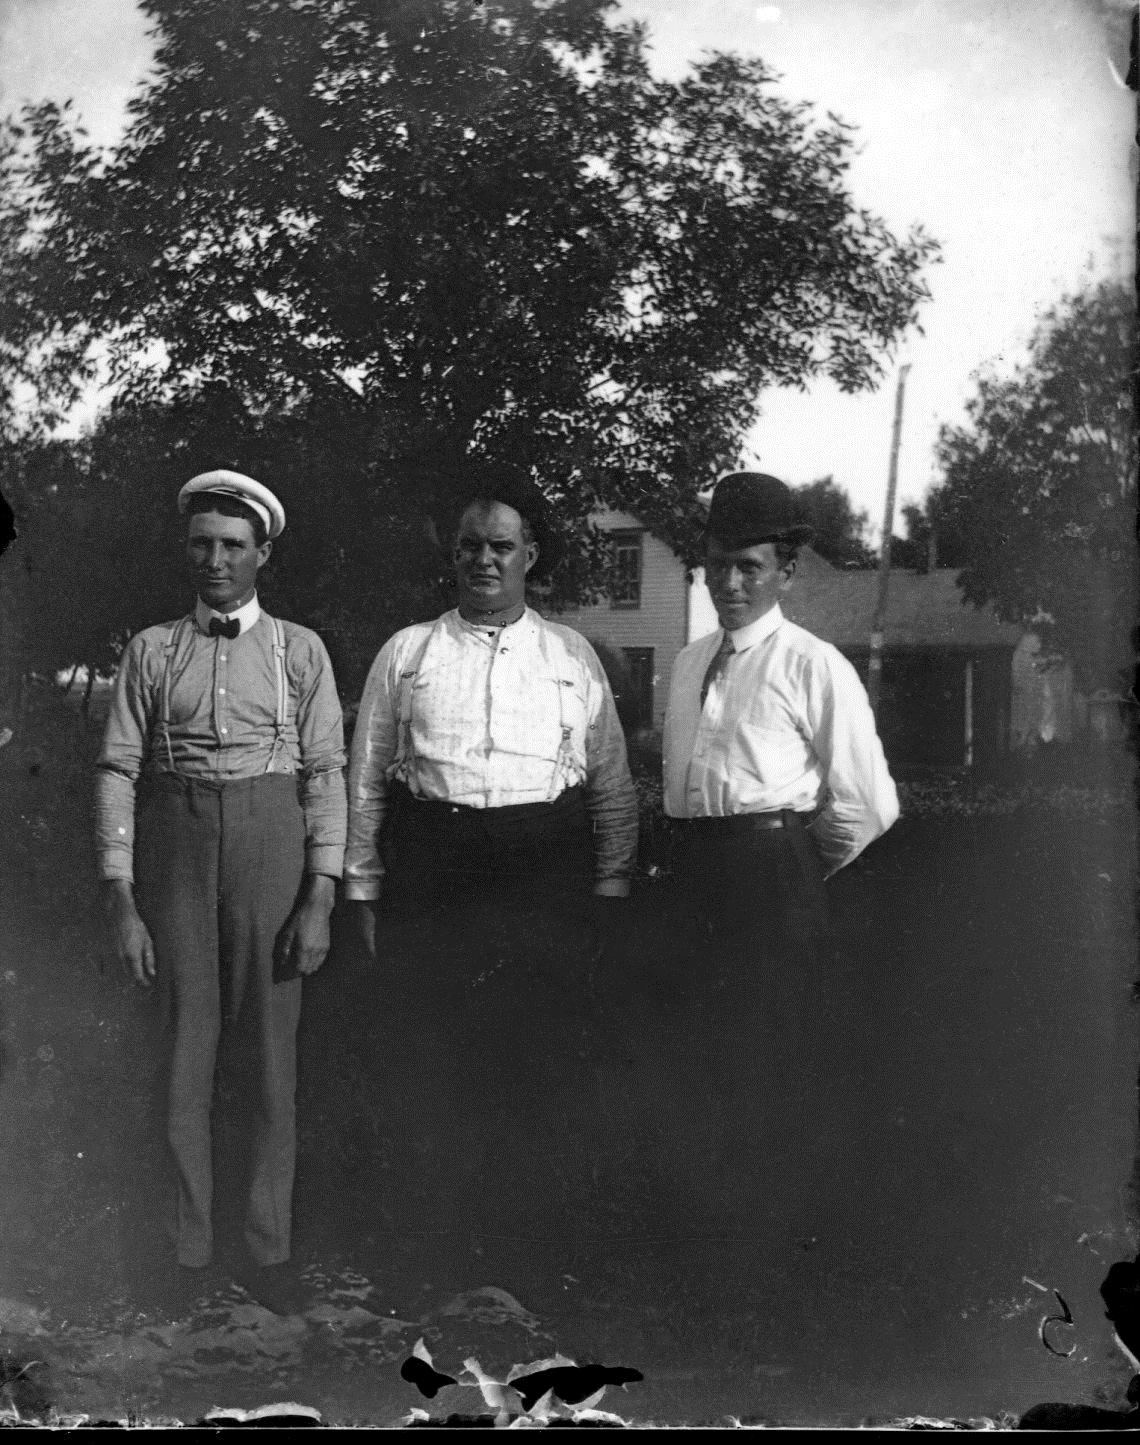 photo of Unidentified Men